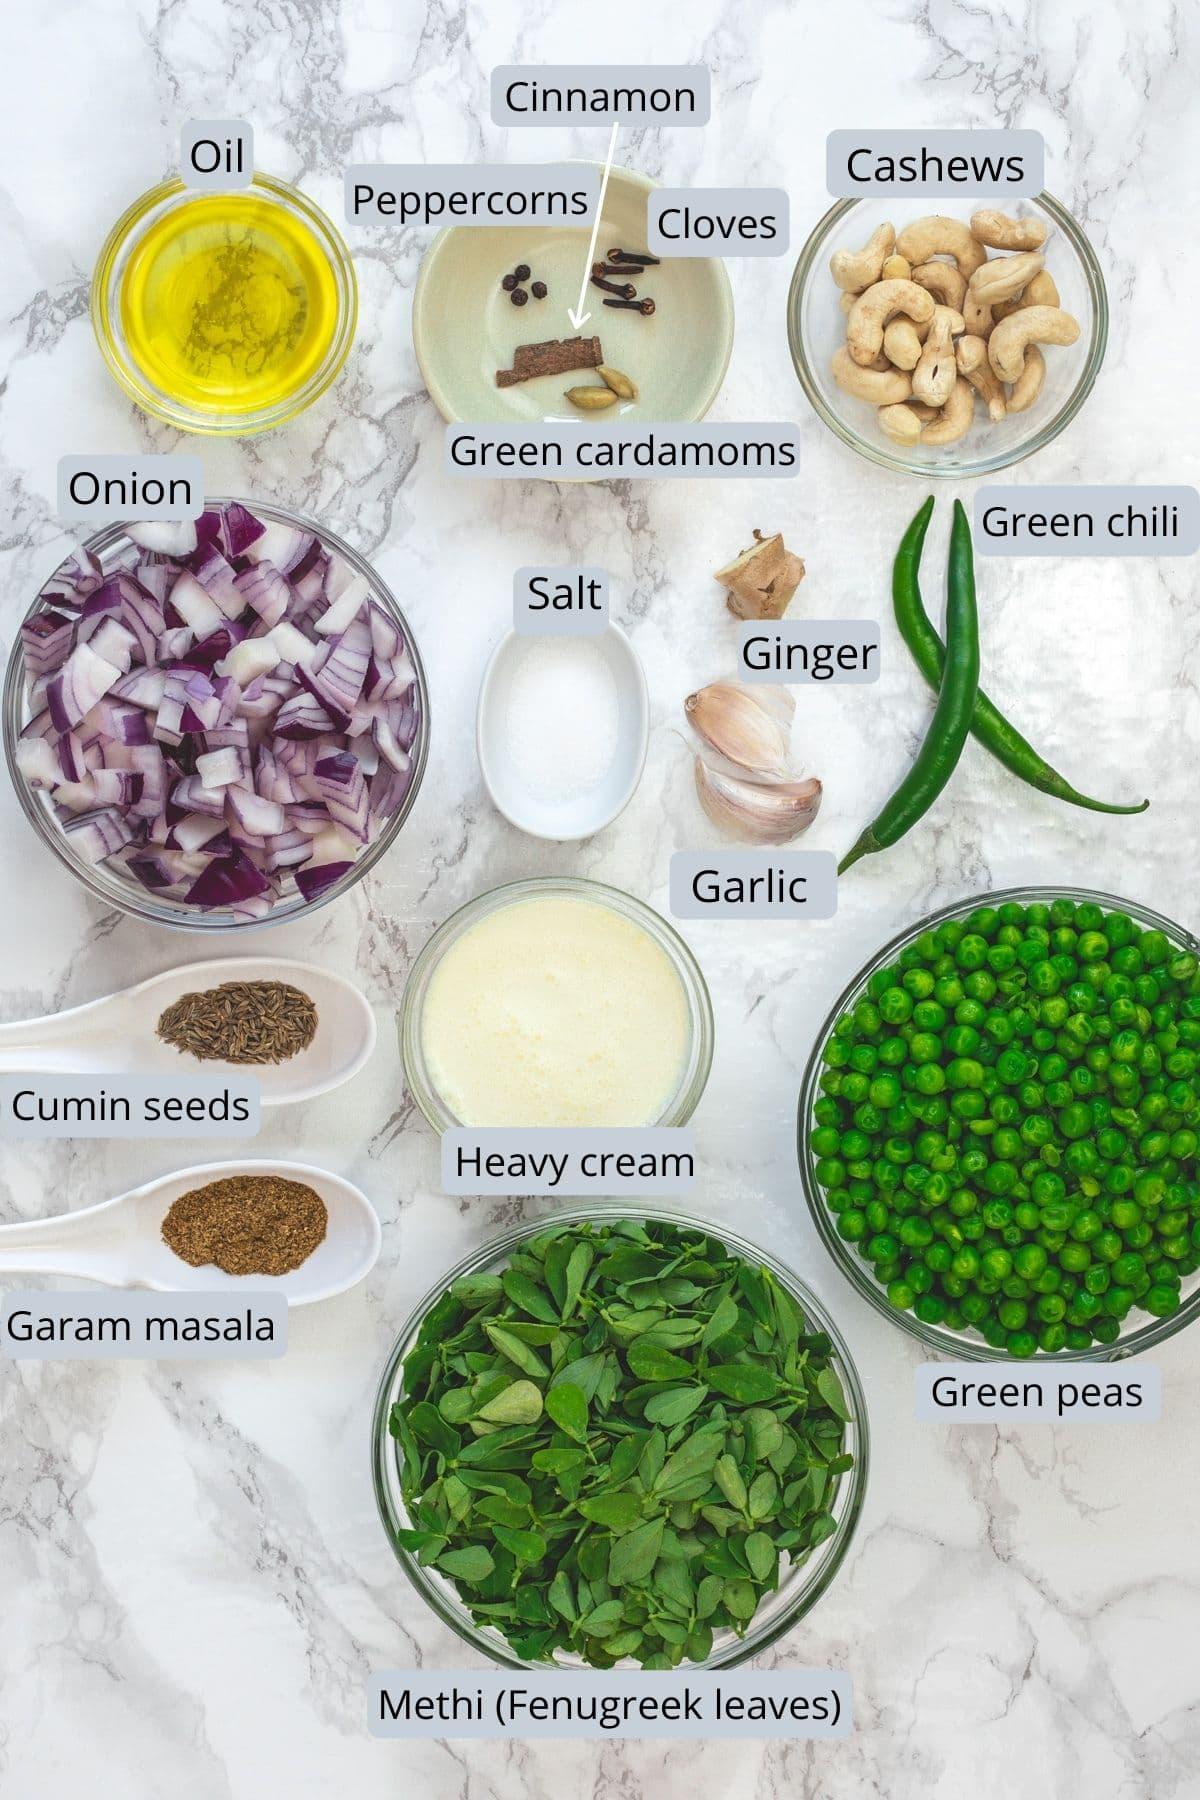 Ingredients used in methi matar malai recipe in separate bowl and spoons.